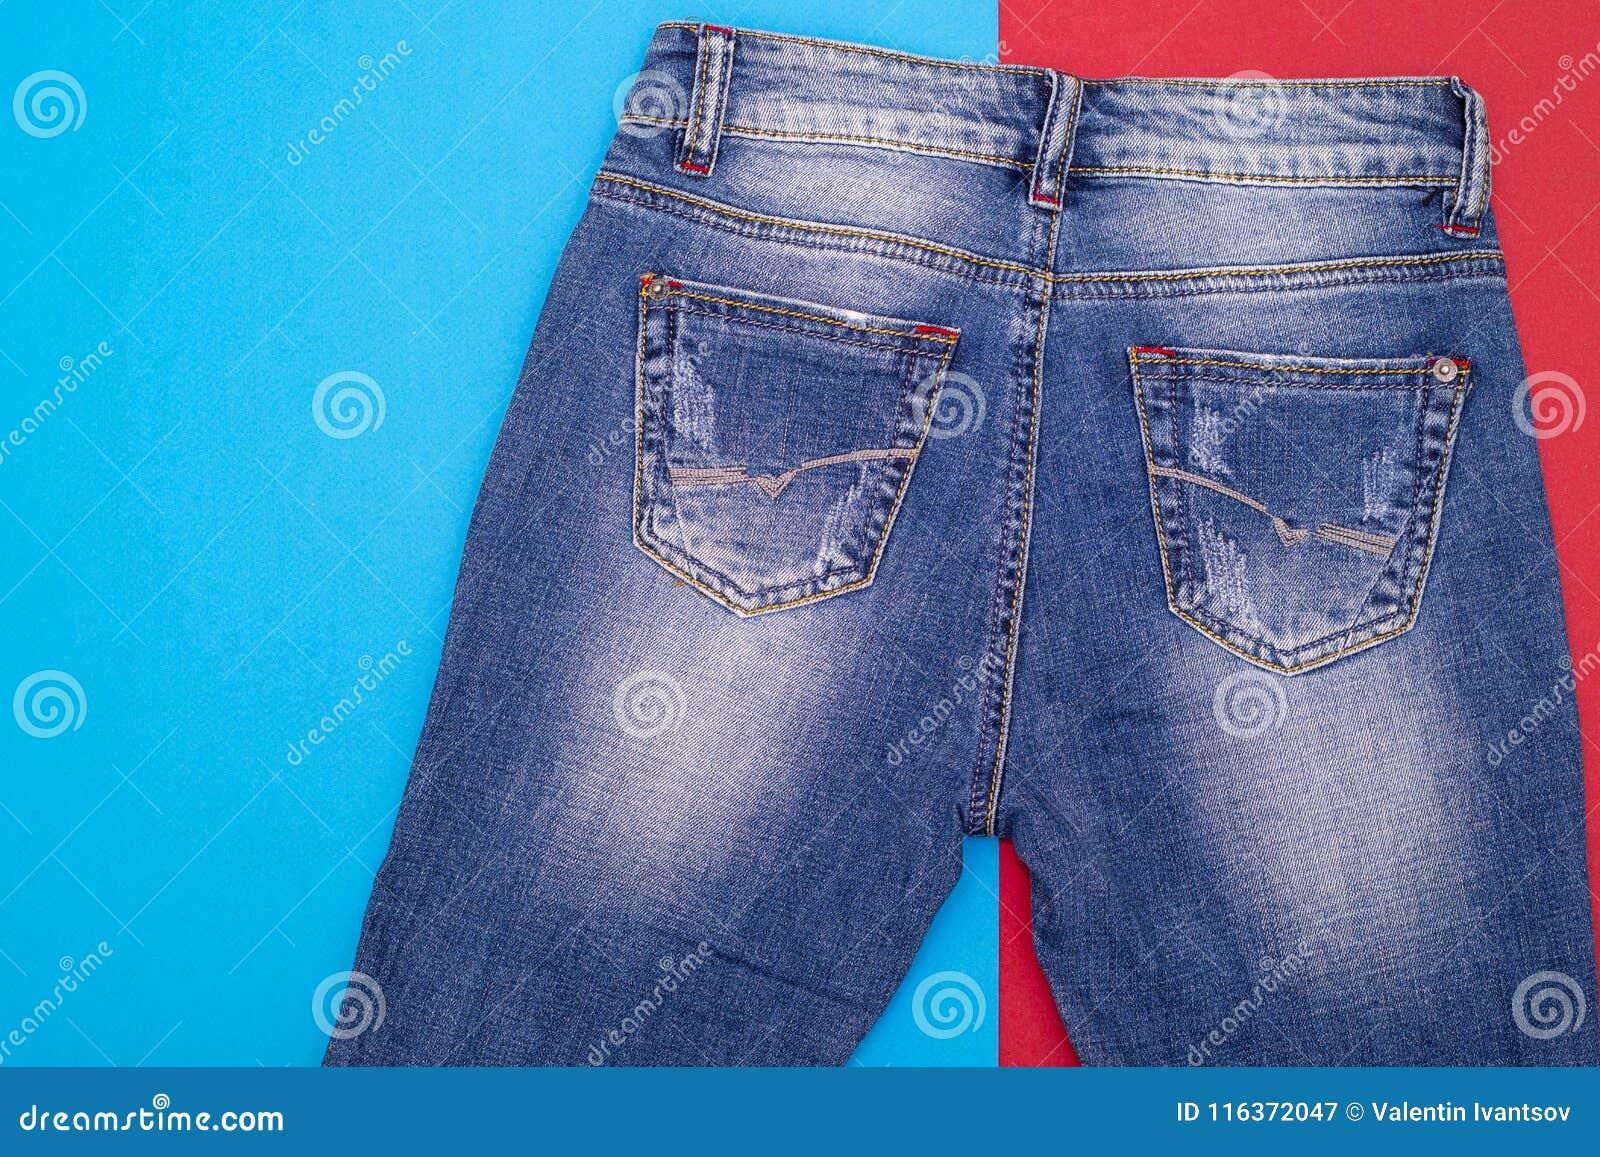 73c92fe50fce Shabby jeans light blue stock image. Image of object - 116372047